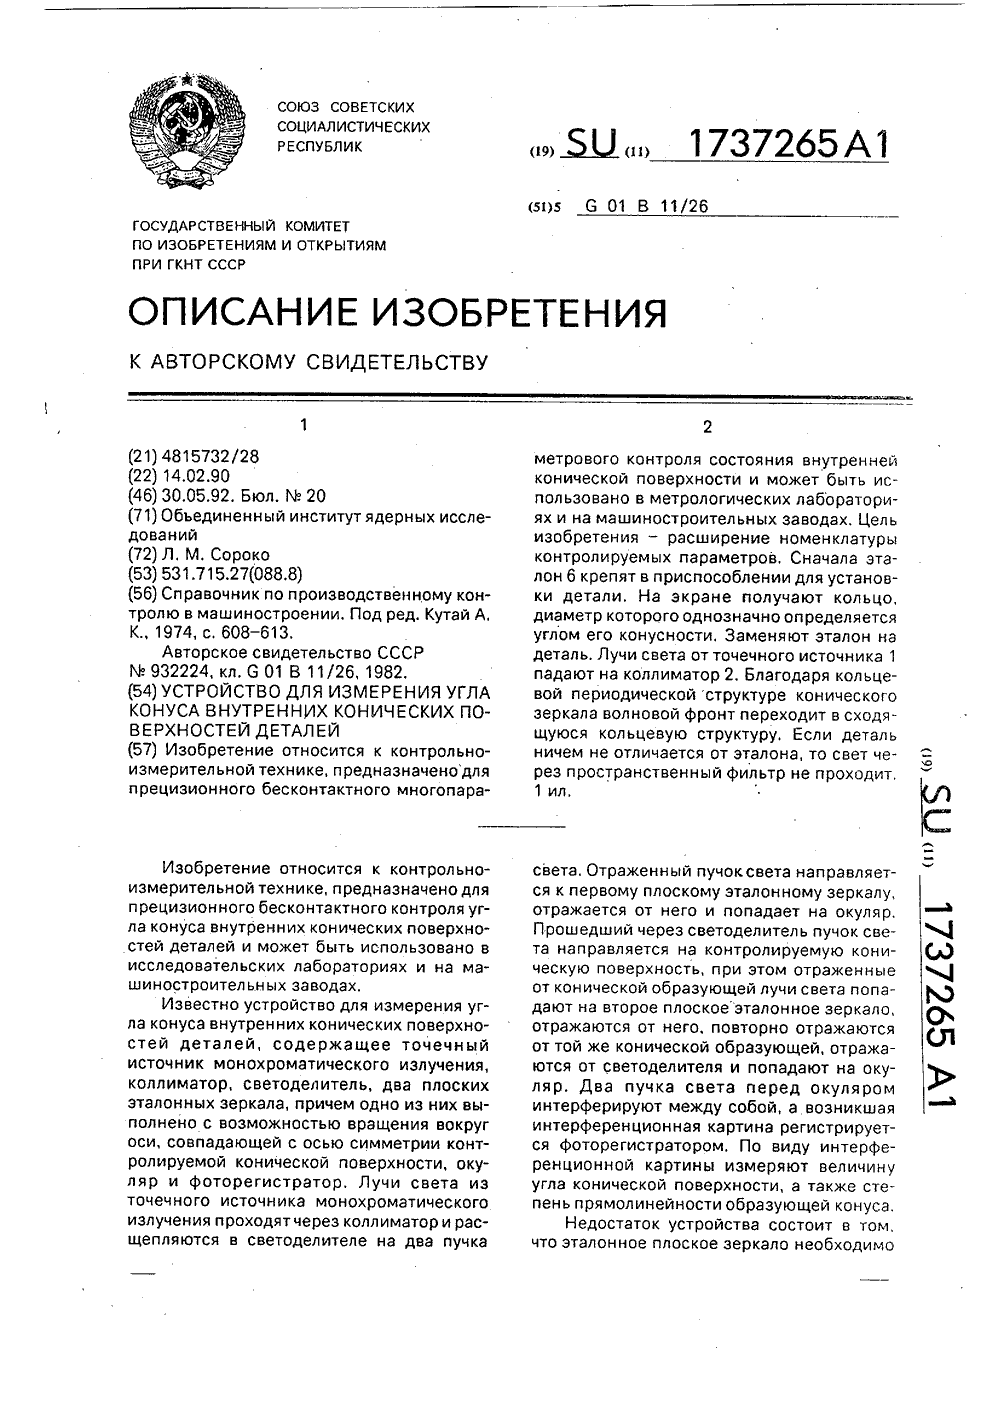 Экзофтальмометр